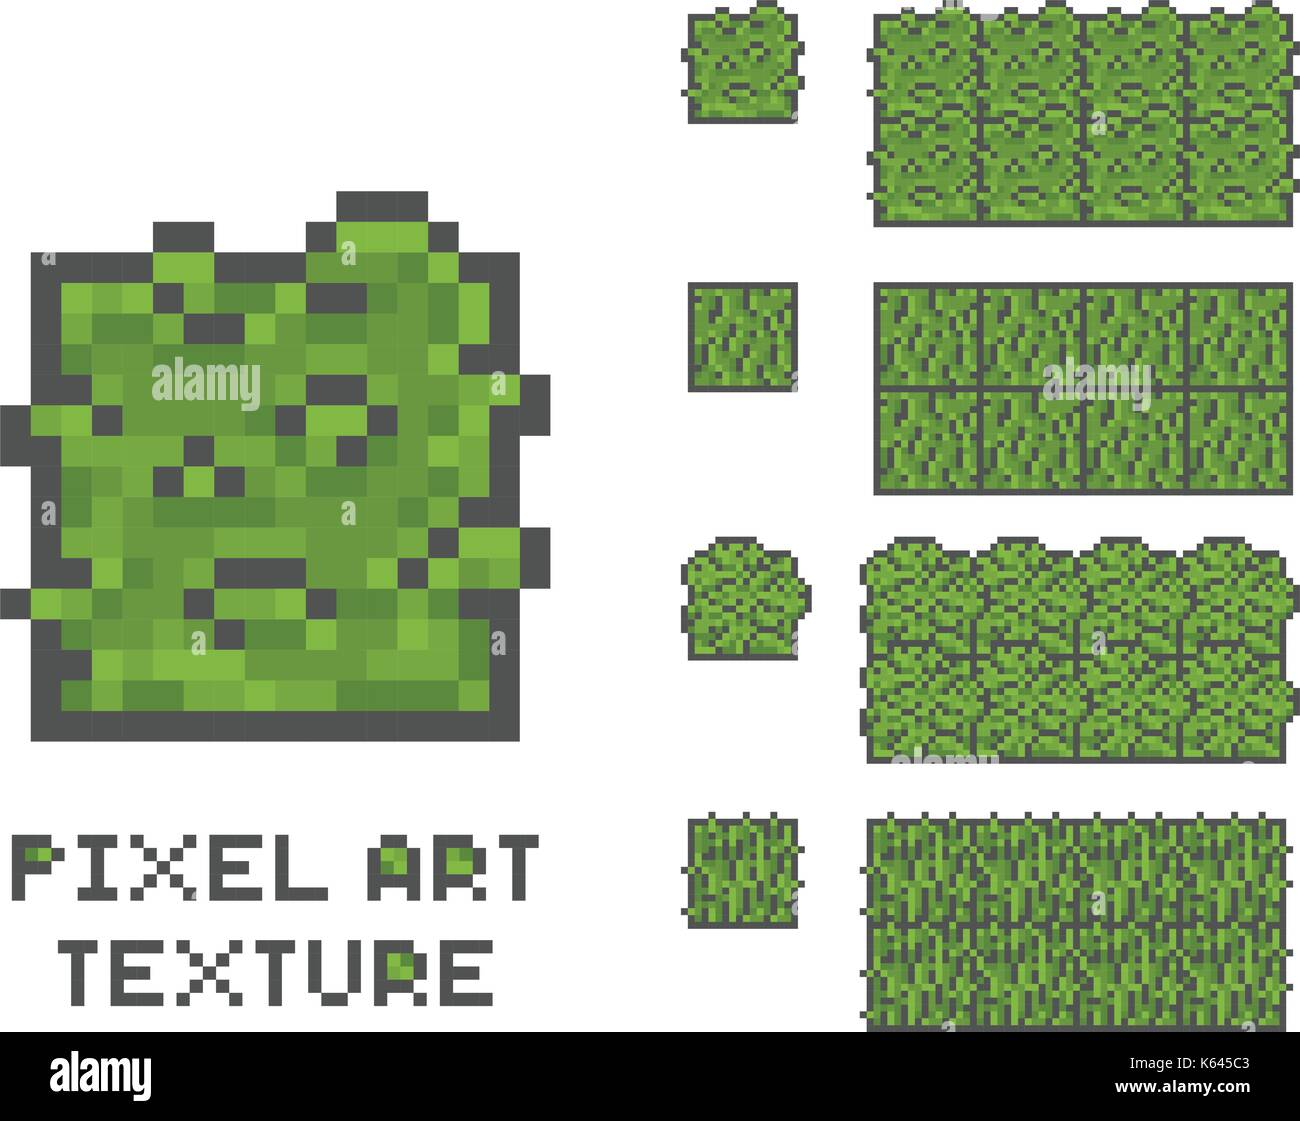 seamless grass texture game. Pixel Art 8 Bit Game Sprite Illustration. Green Grass Tree Pixelated Pattern, Seamless Texture